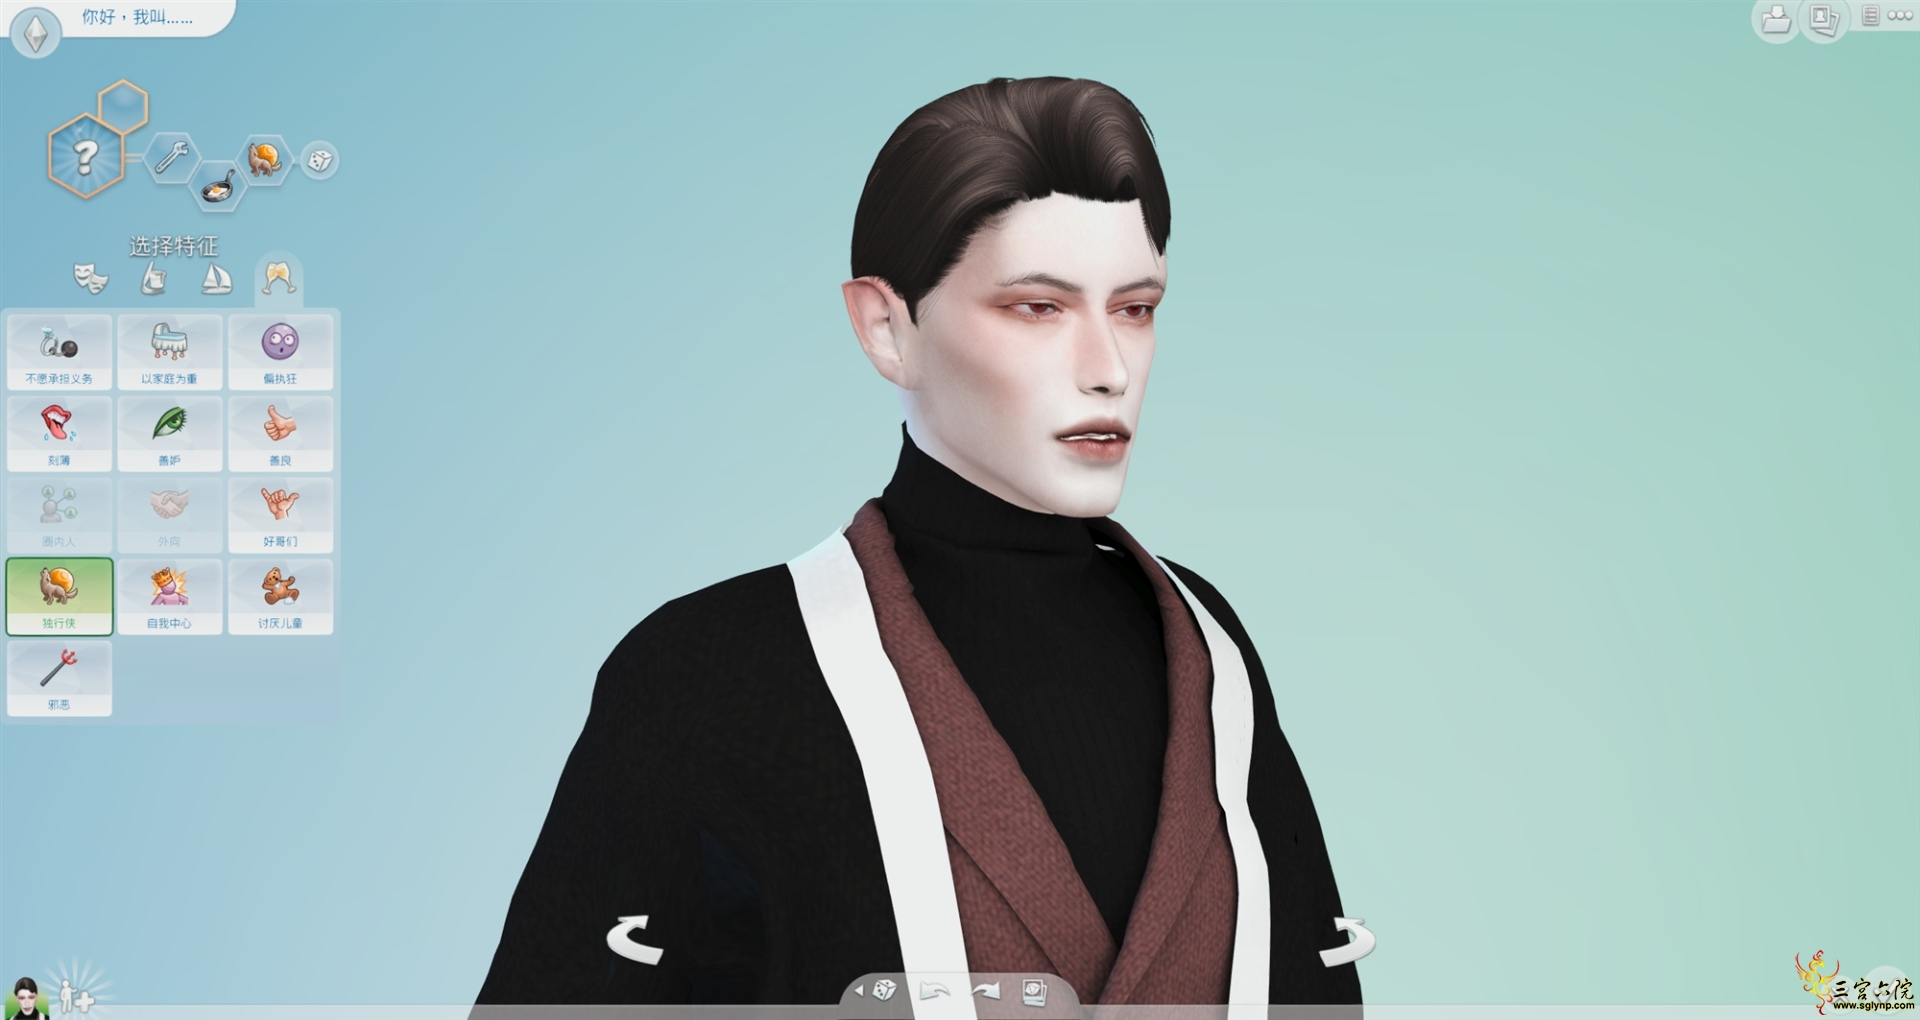 Sims 4 Screenshot 2020.10.07 - 15.01.29.24_副本.jpg